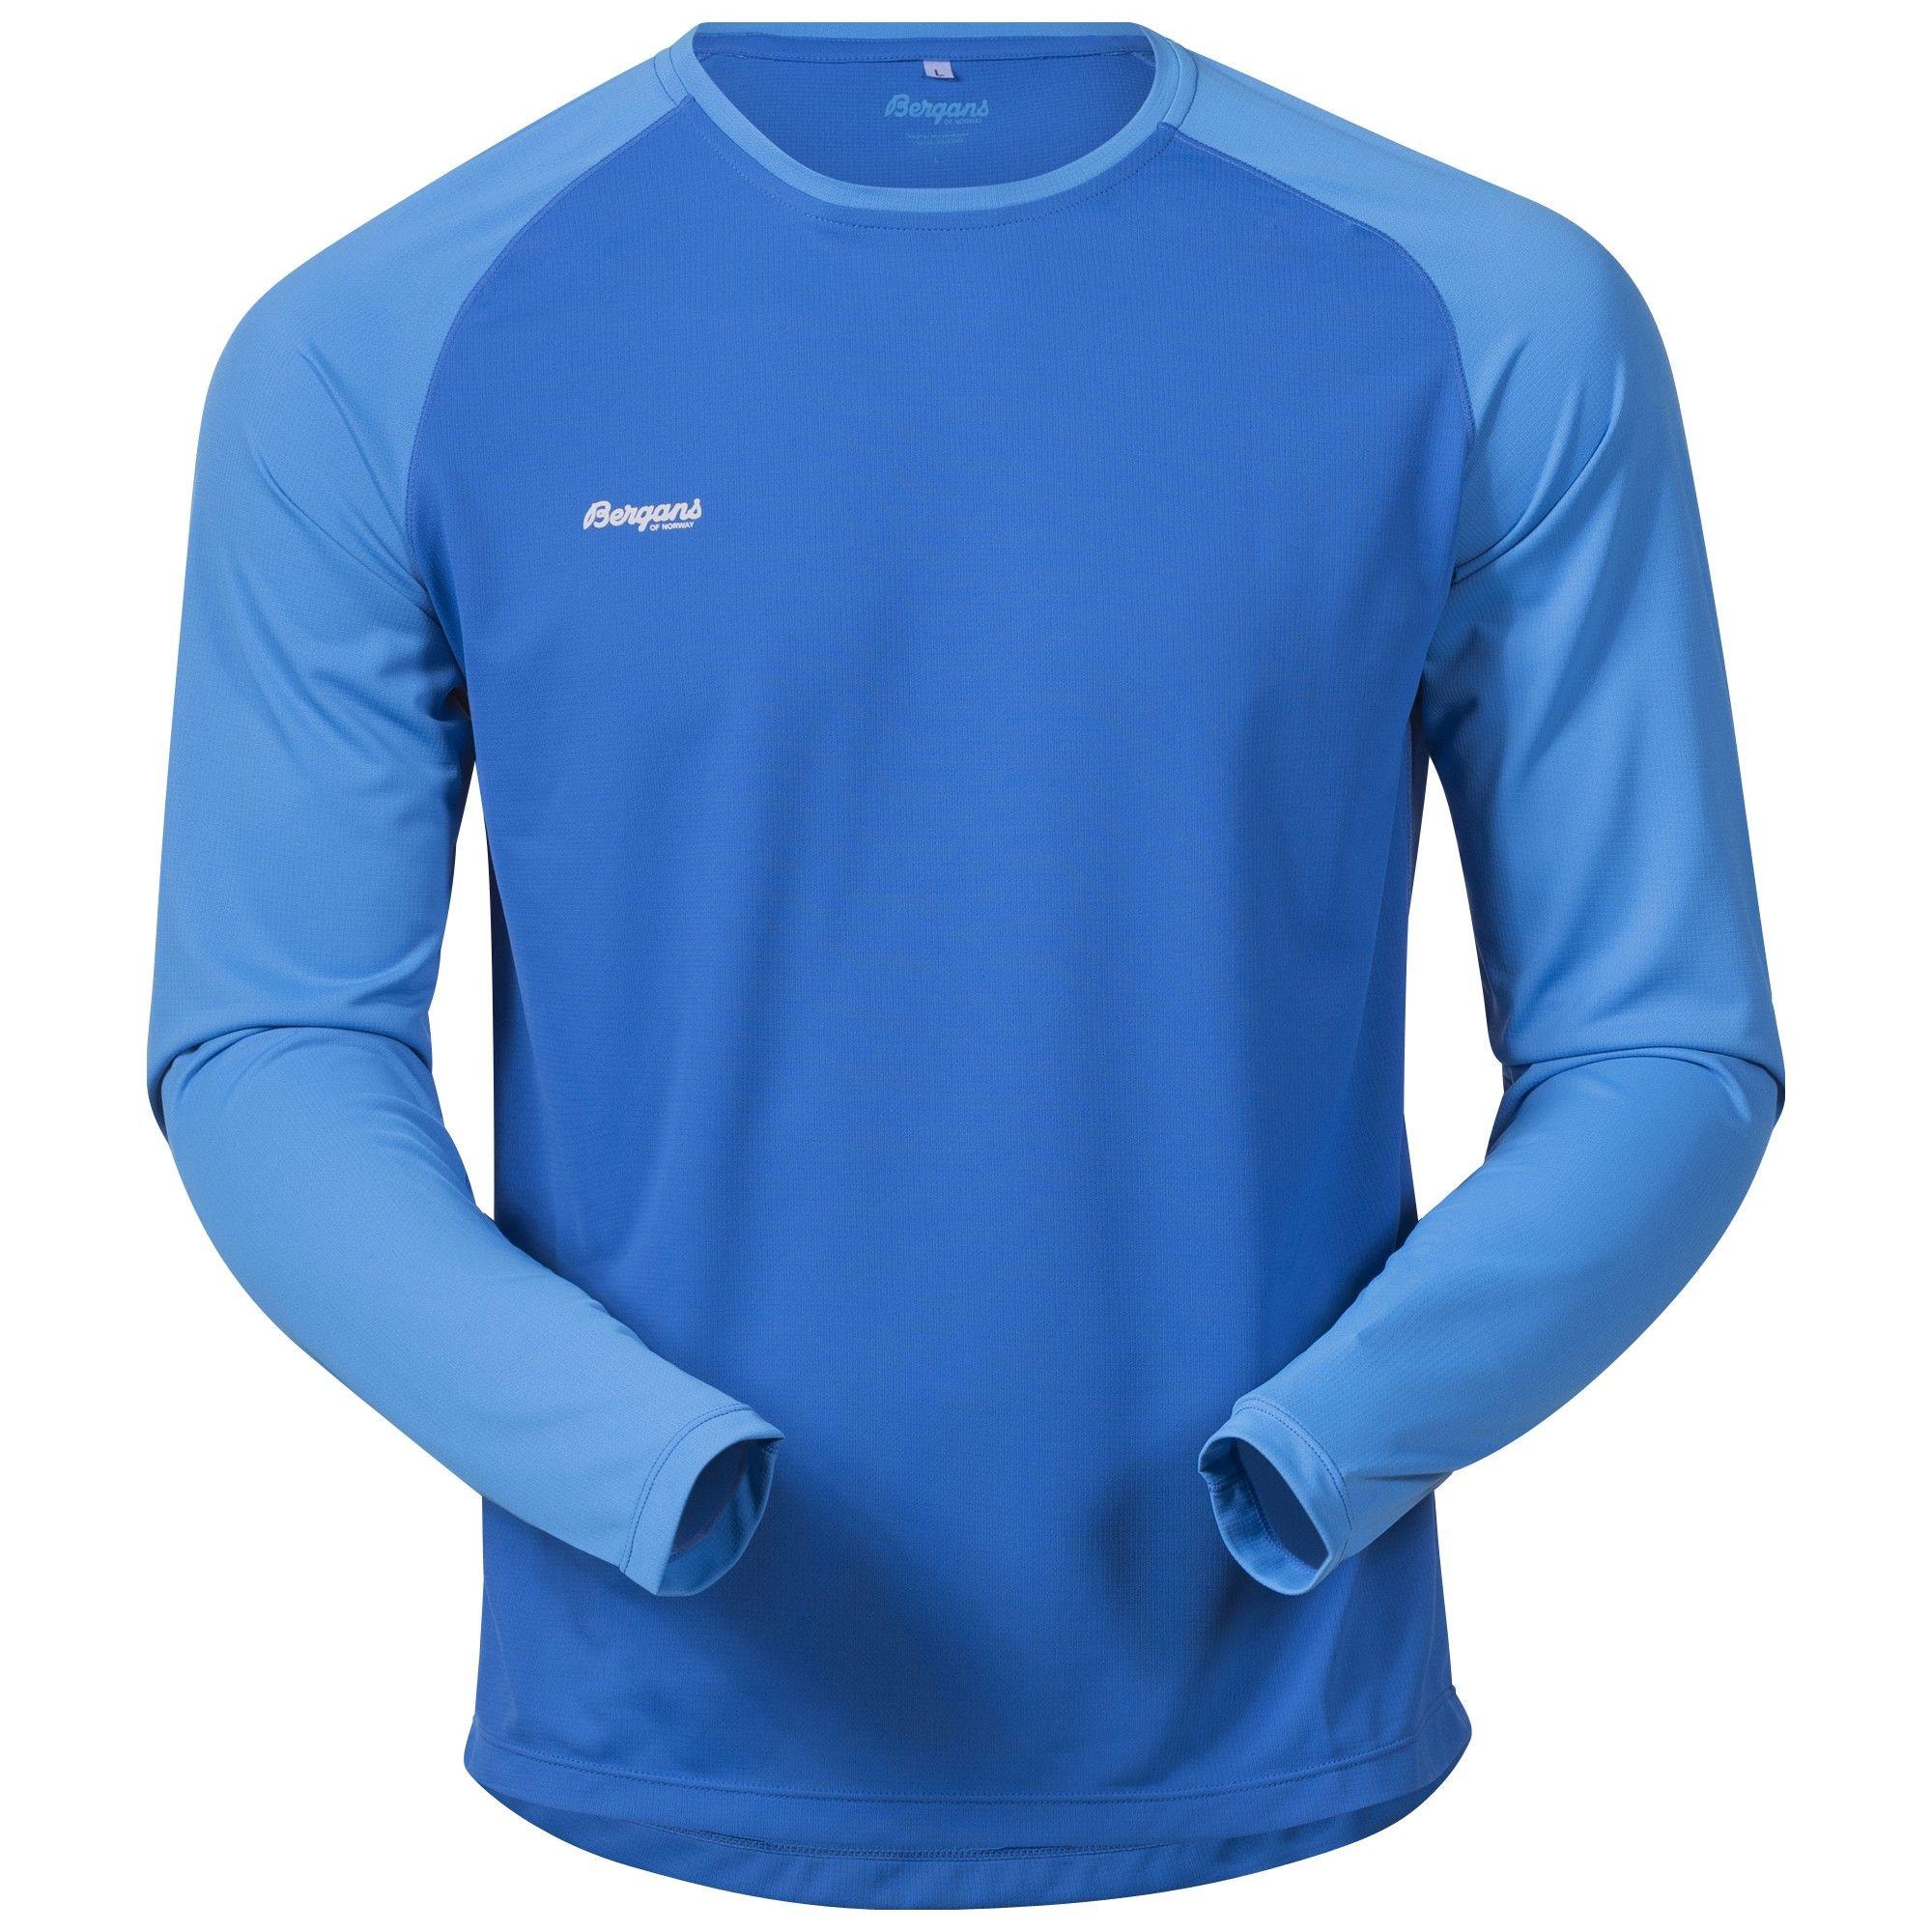 Bergans Slingsby Long Sleeve | Größe S,M,L,XL,XXL | Herren Langarm-Shirt